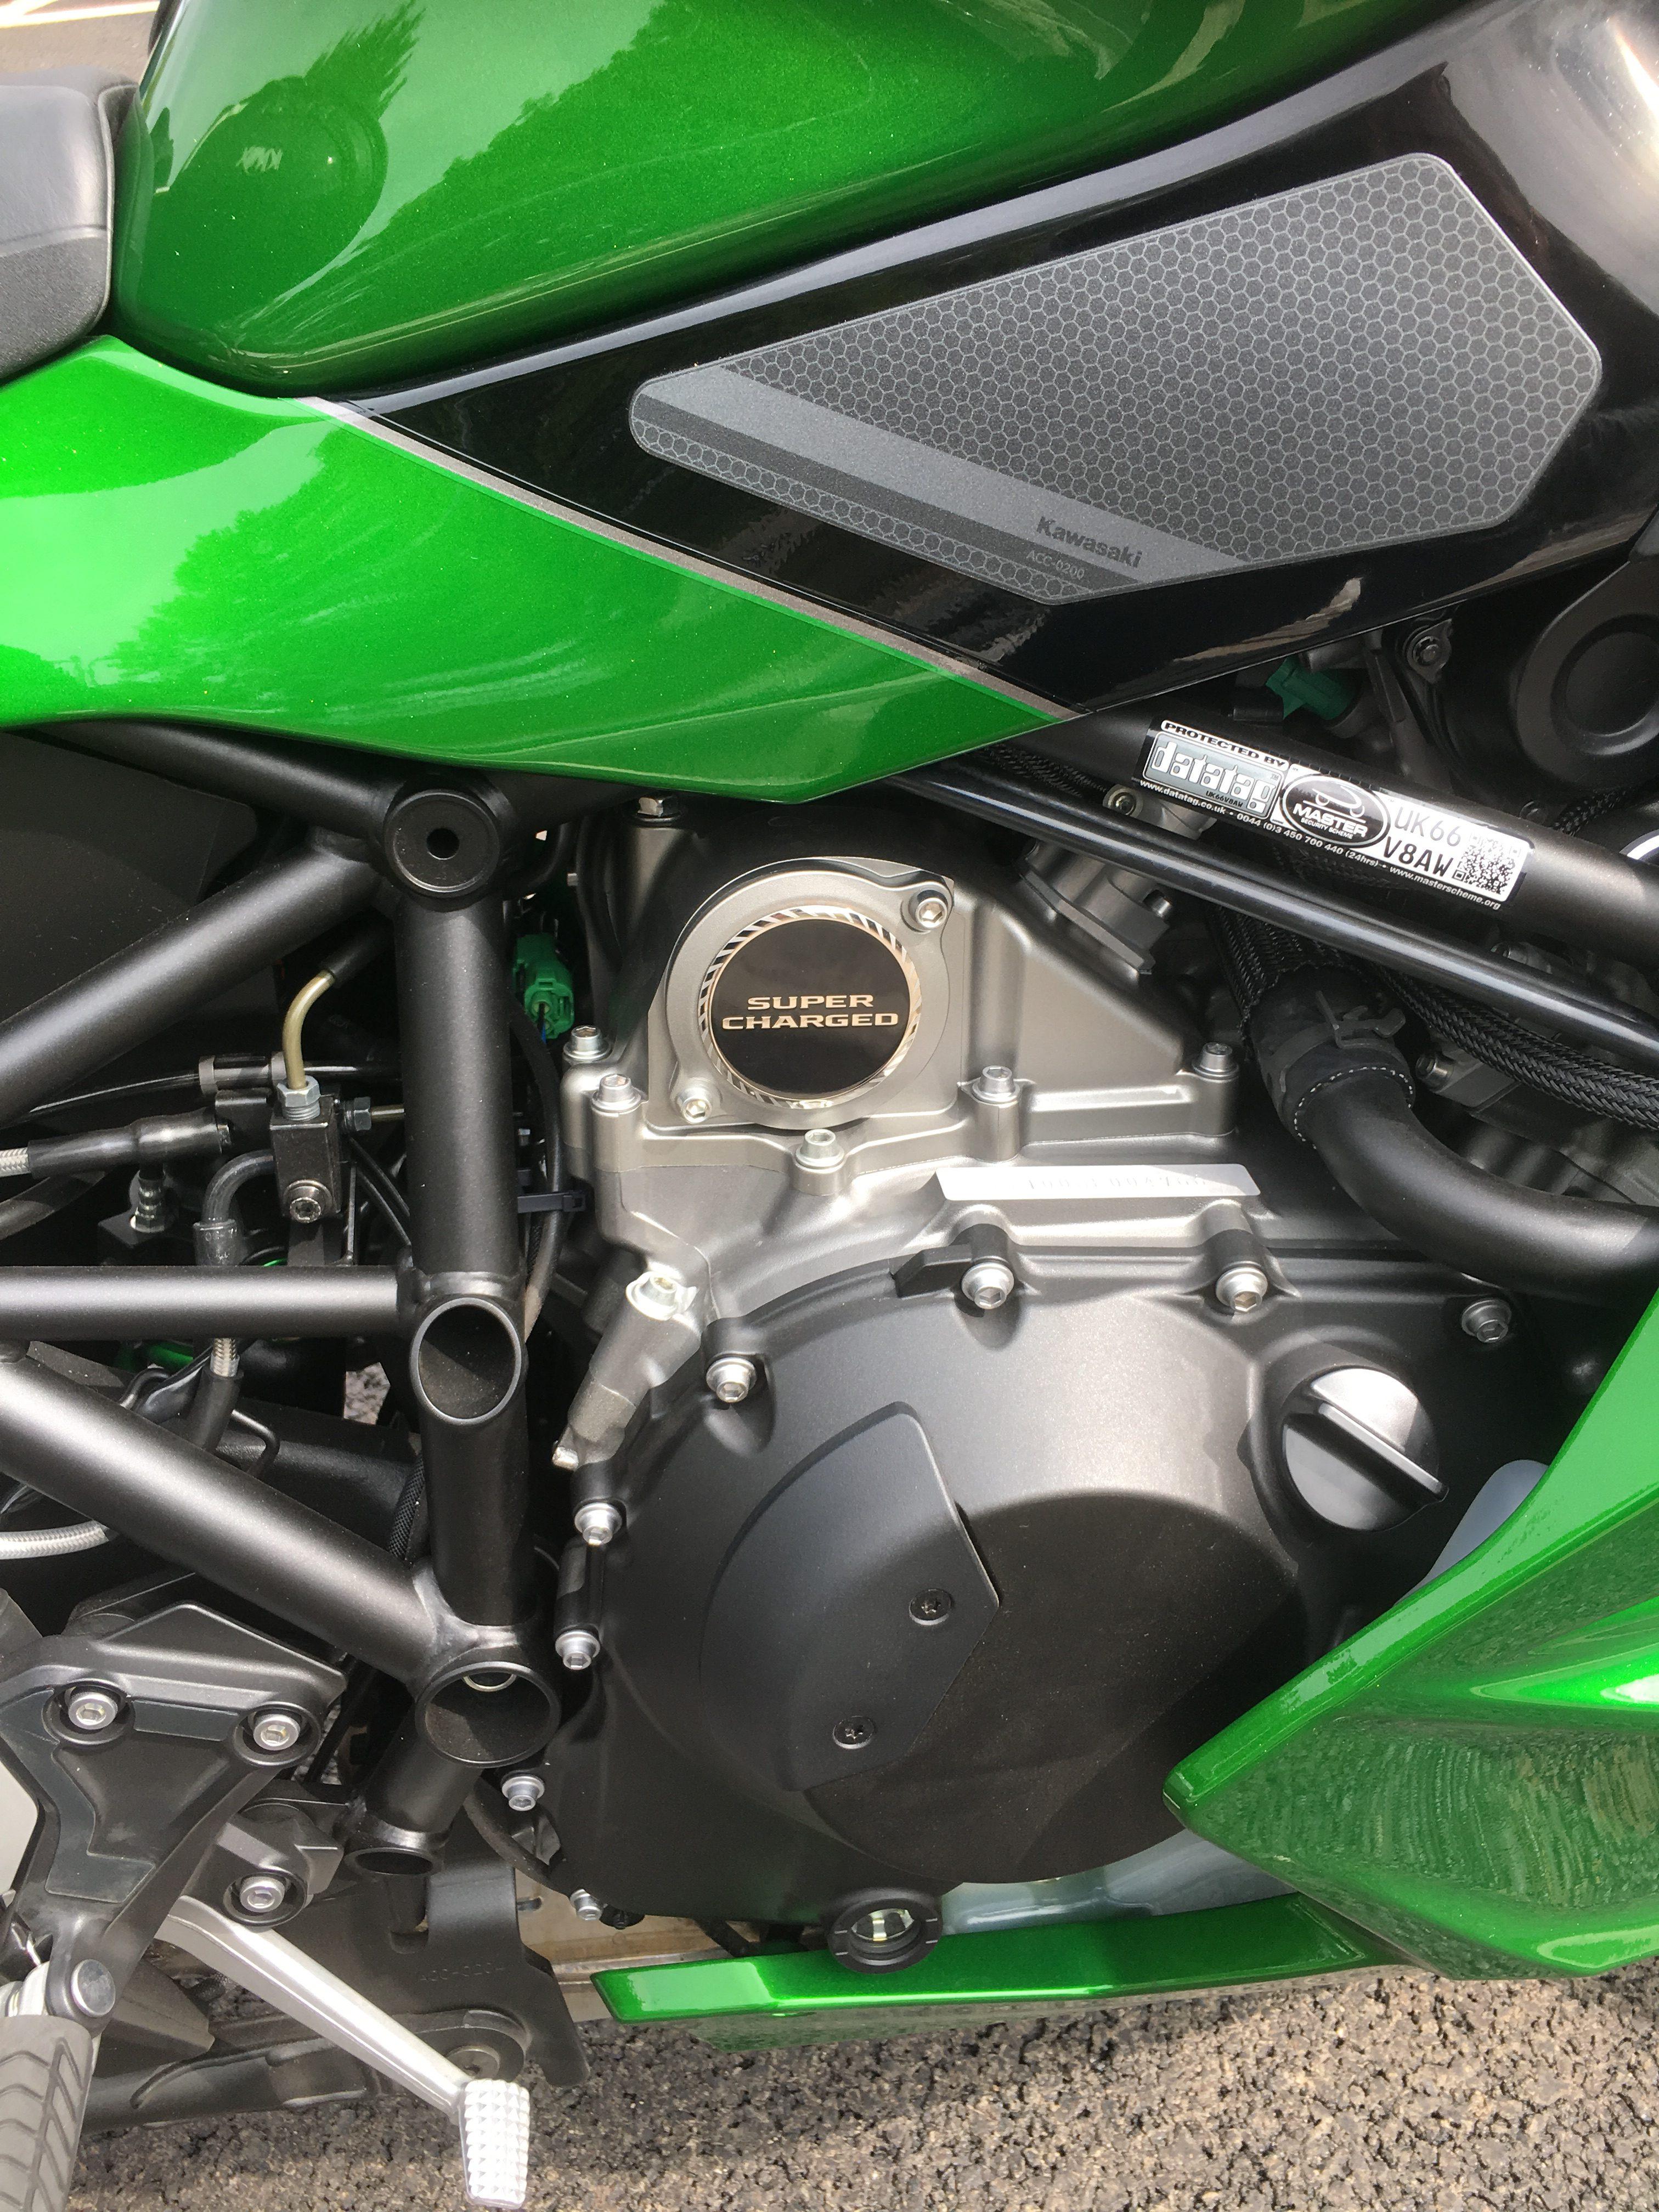 H2 Supercharger